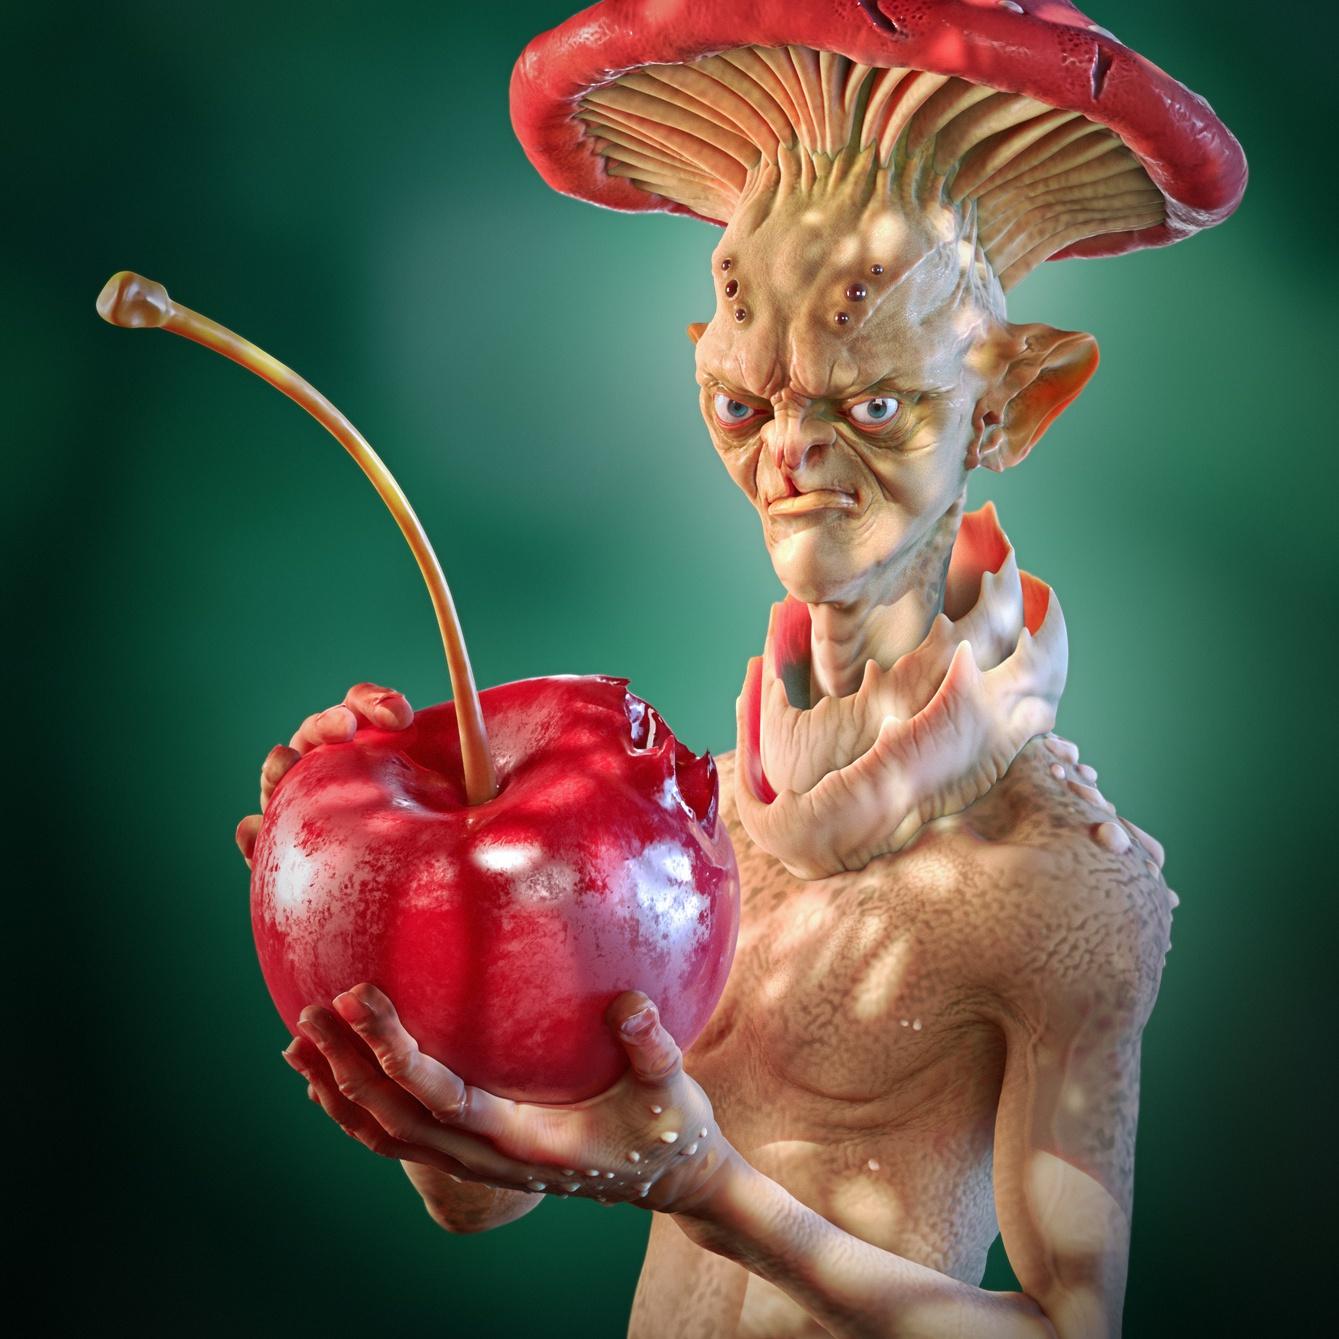 fantasy character design mushroom with cherry 3d model